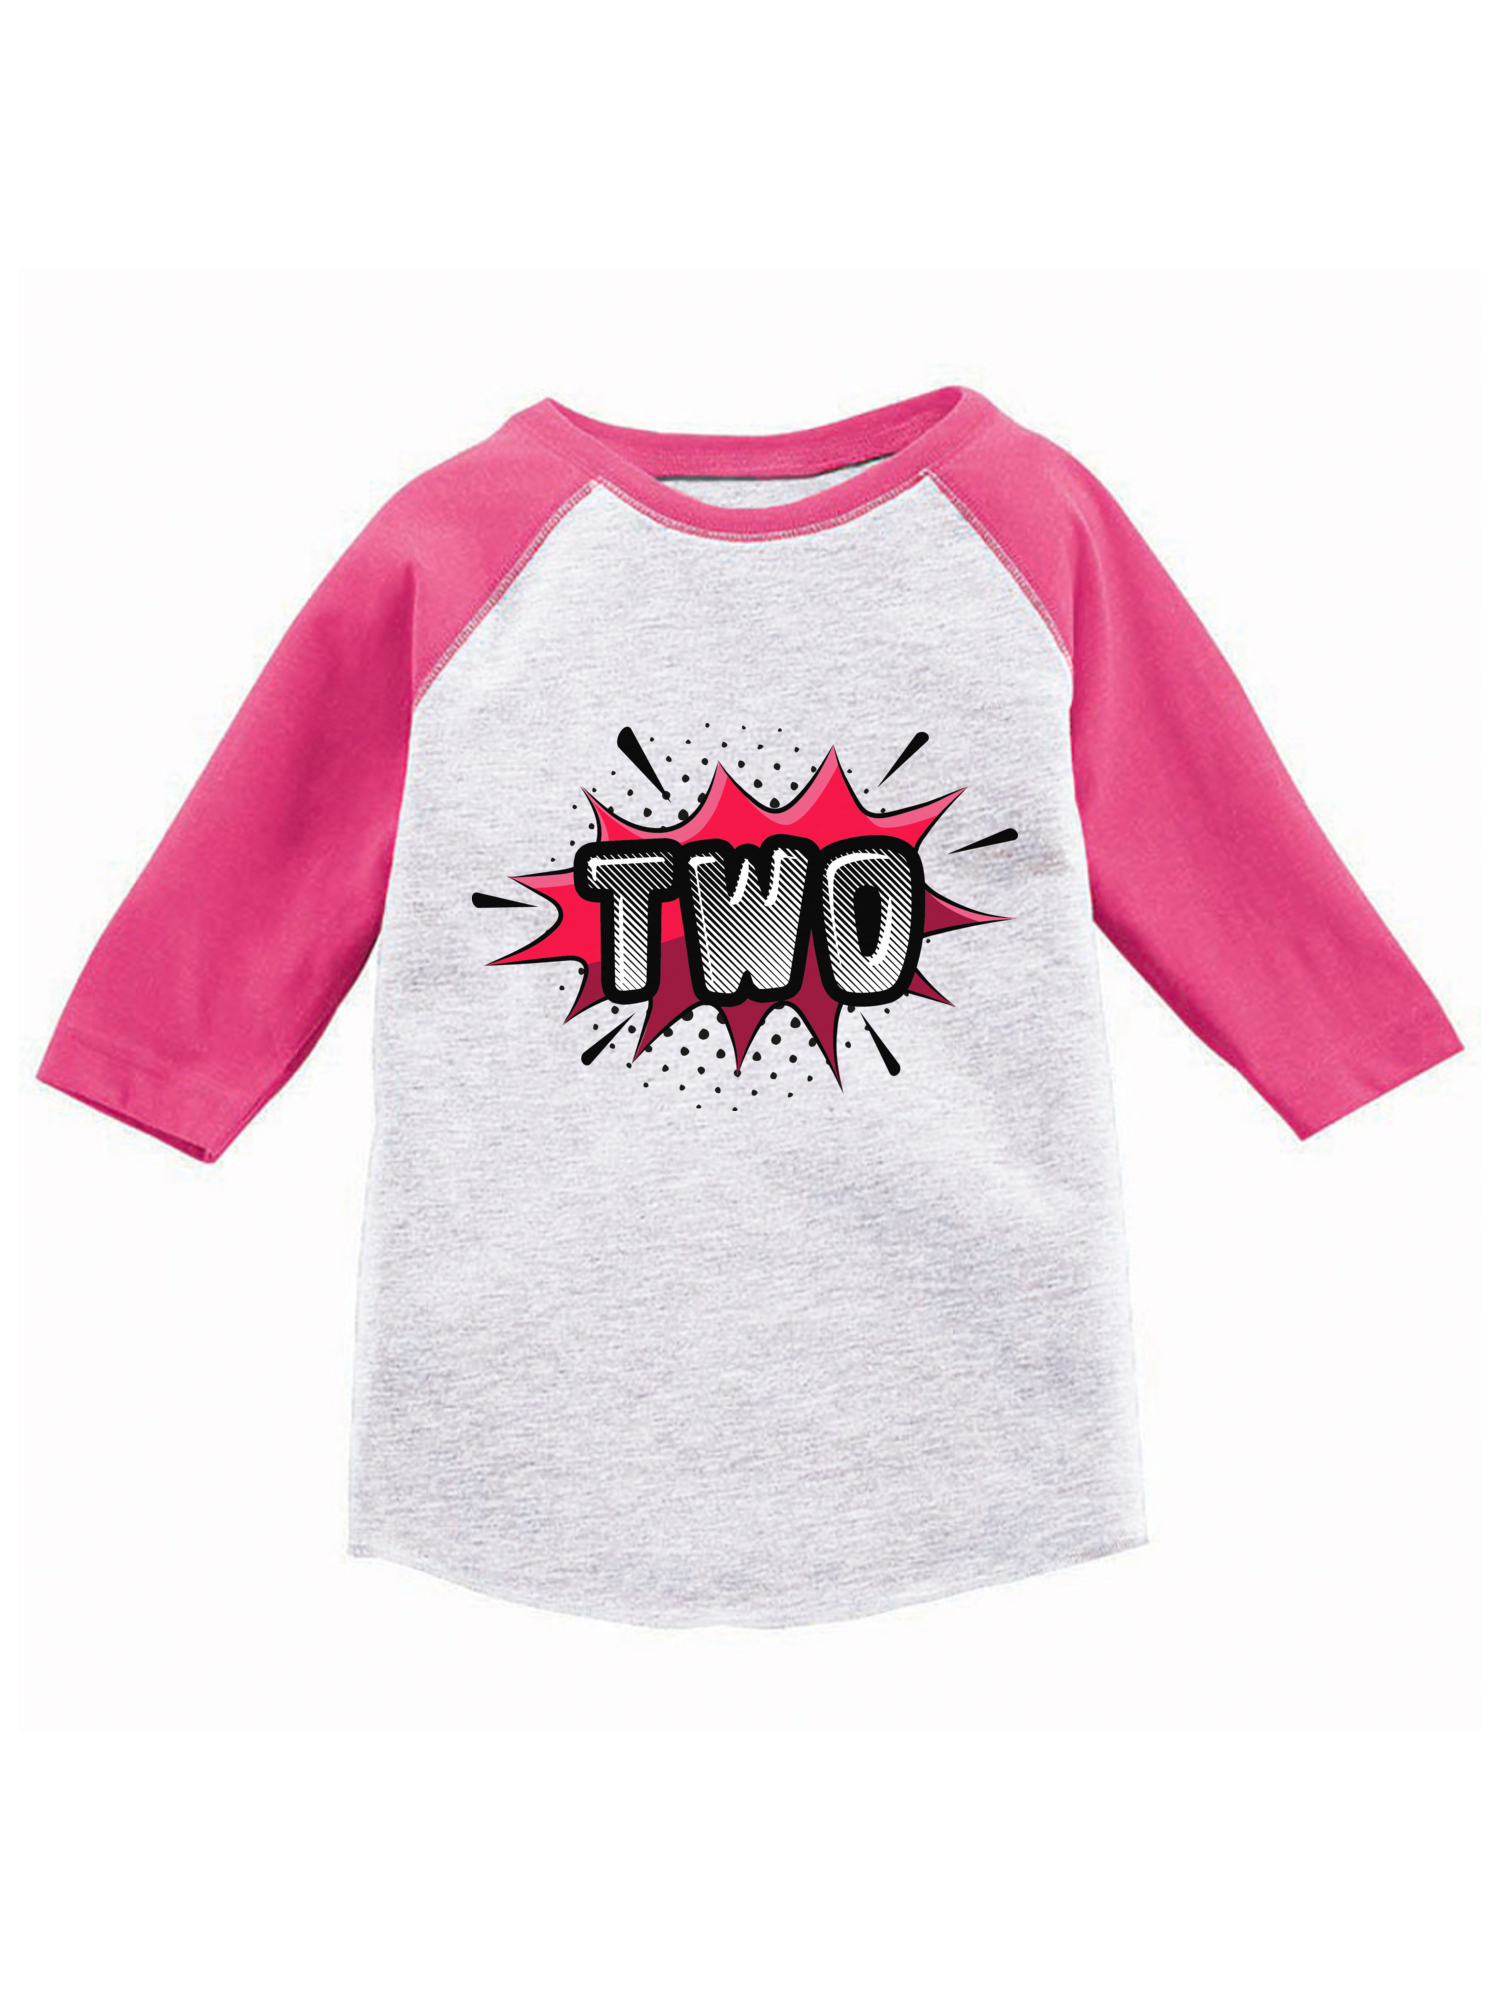 Gift for 2 Year Old Shark 2nd Birthday 3//4 Sleeve Baseball Jersey Toddler Shirt